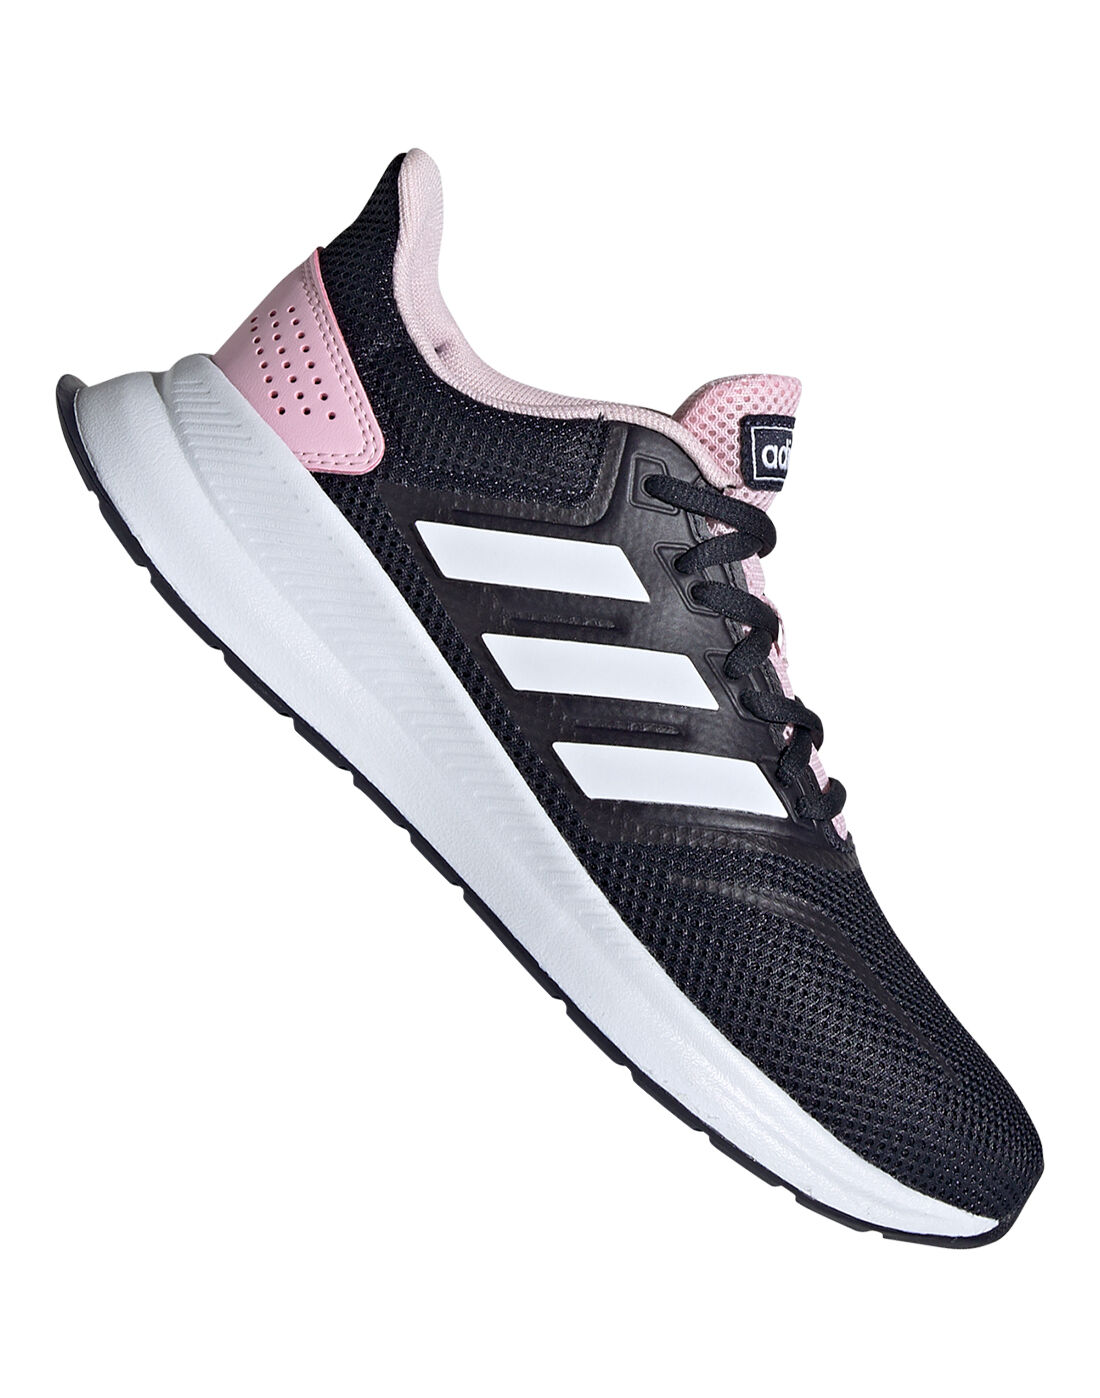 Women's Navy \u0026 Pink adidas Run Falcon